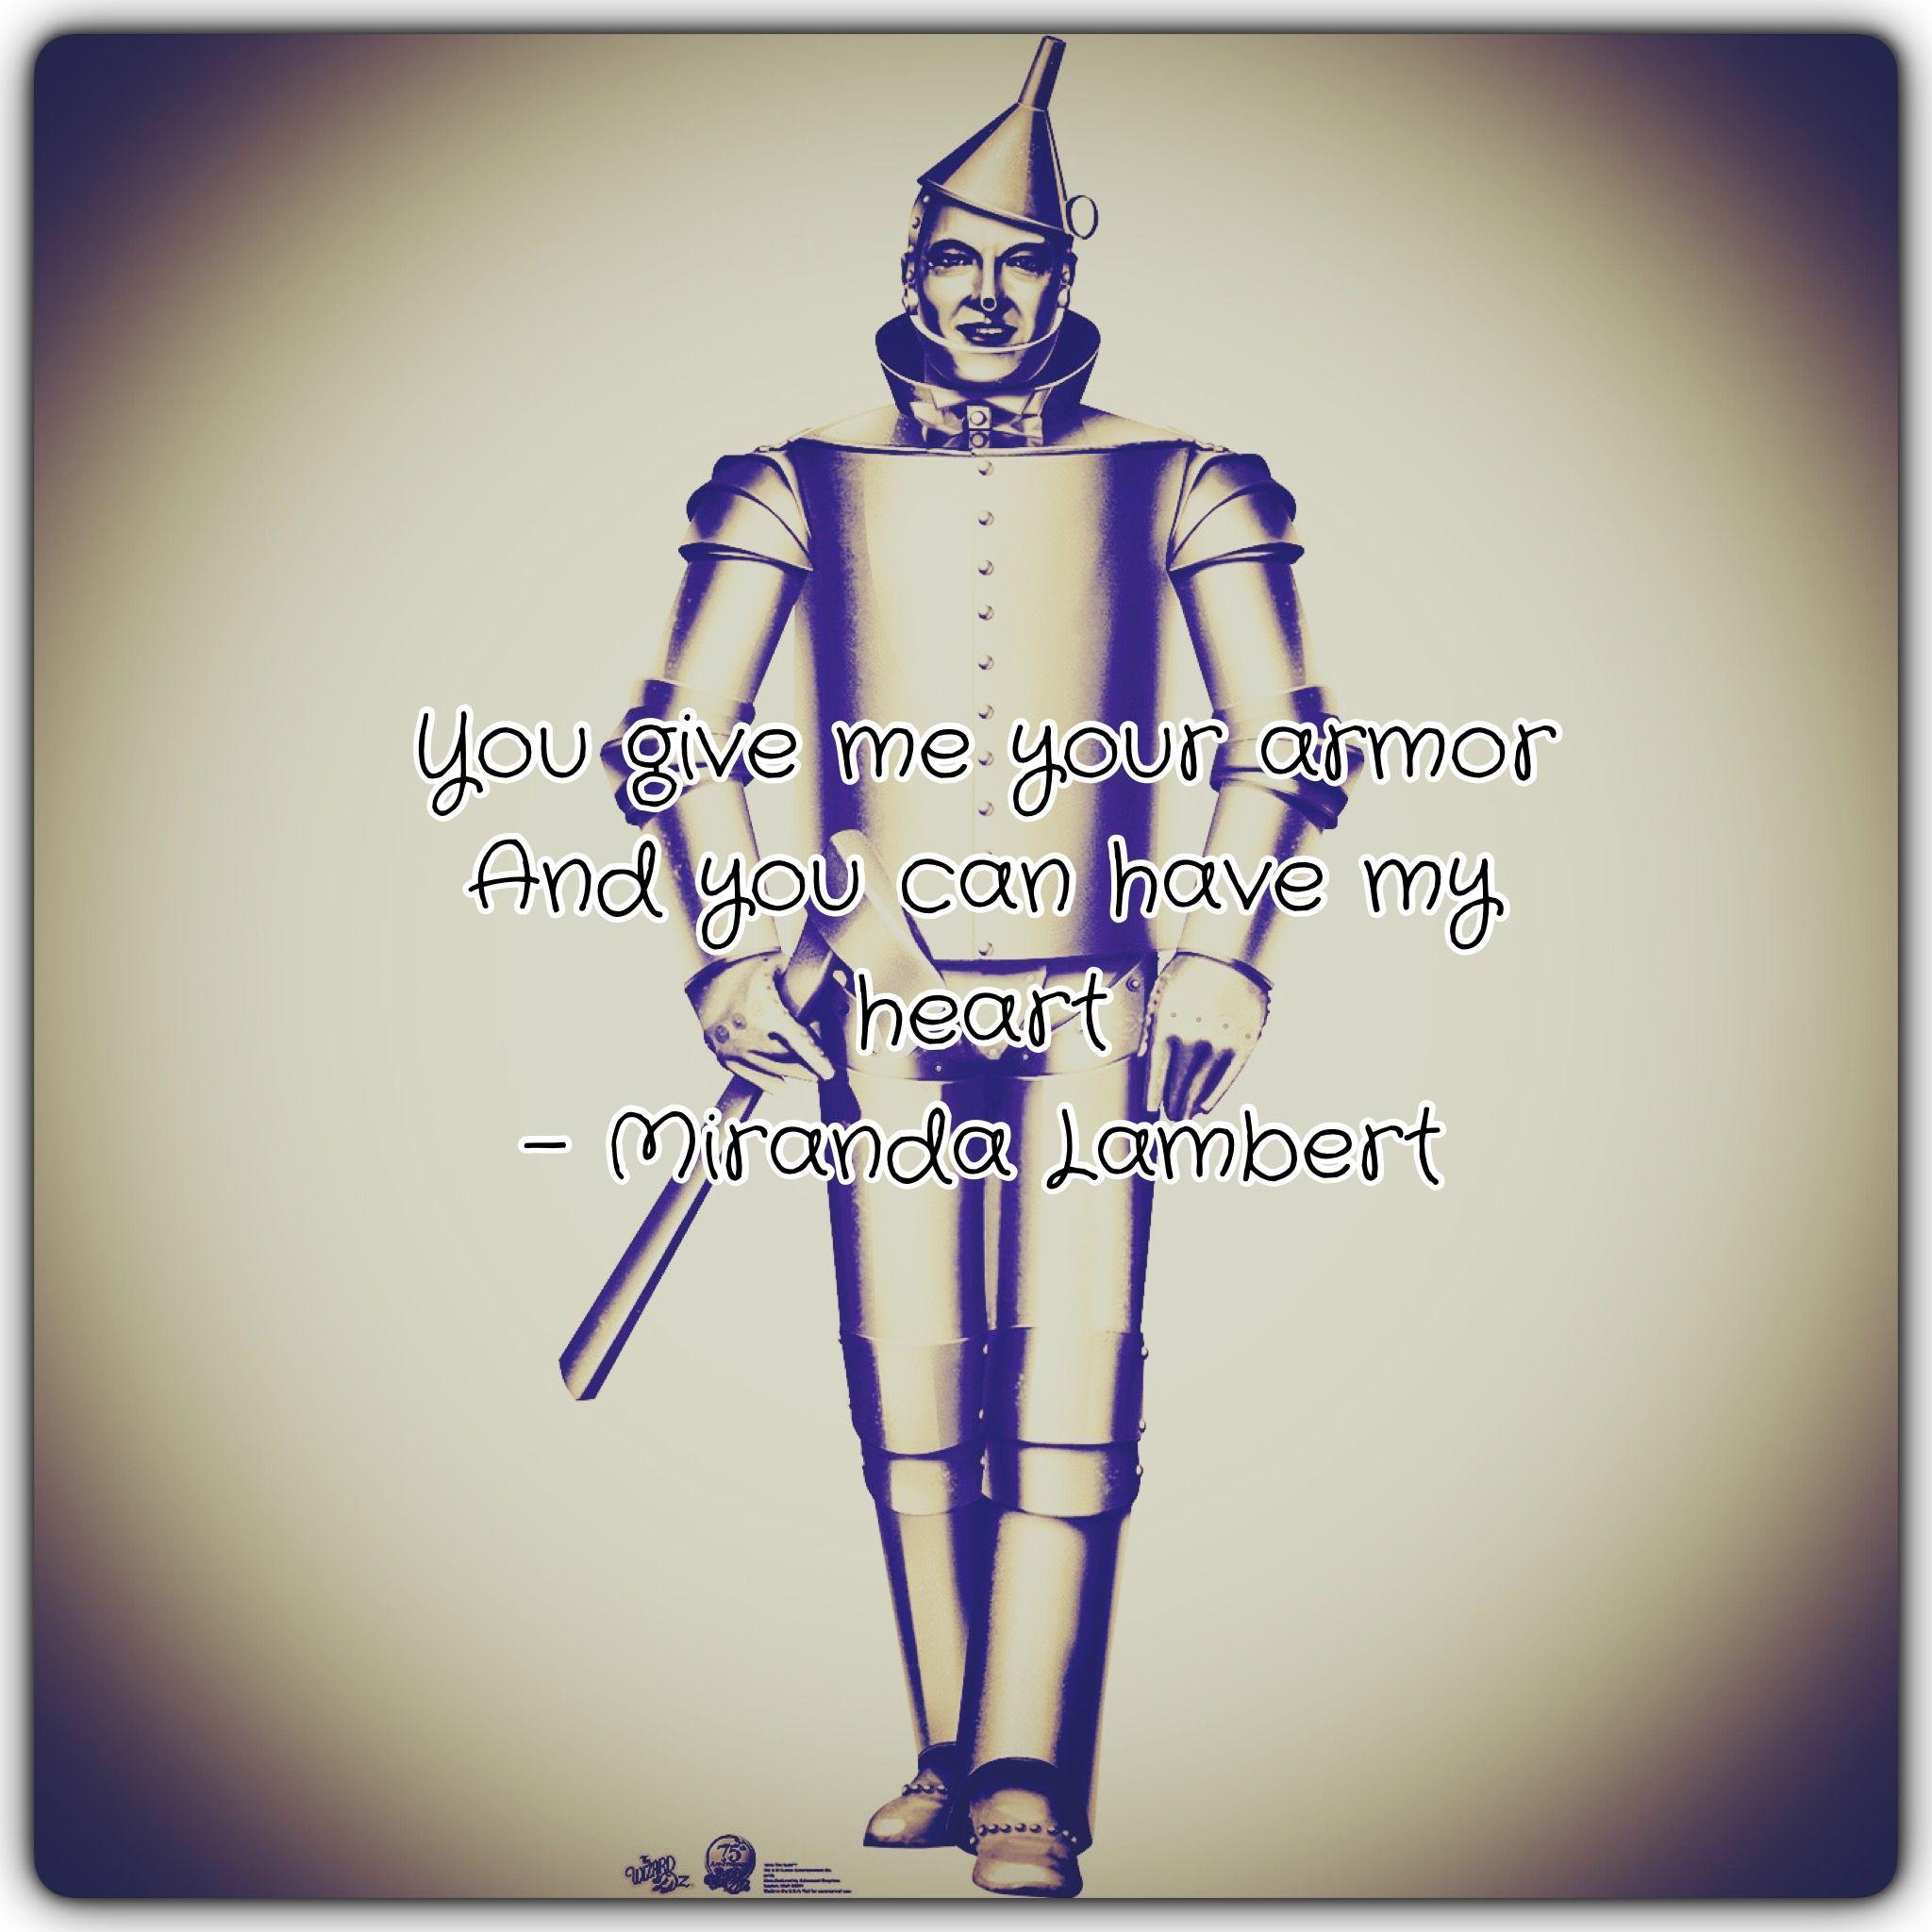 Tin man miranda lambert my misc pinterest tin man for Words to tin man by miranda lambert